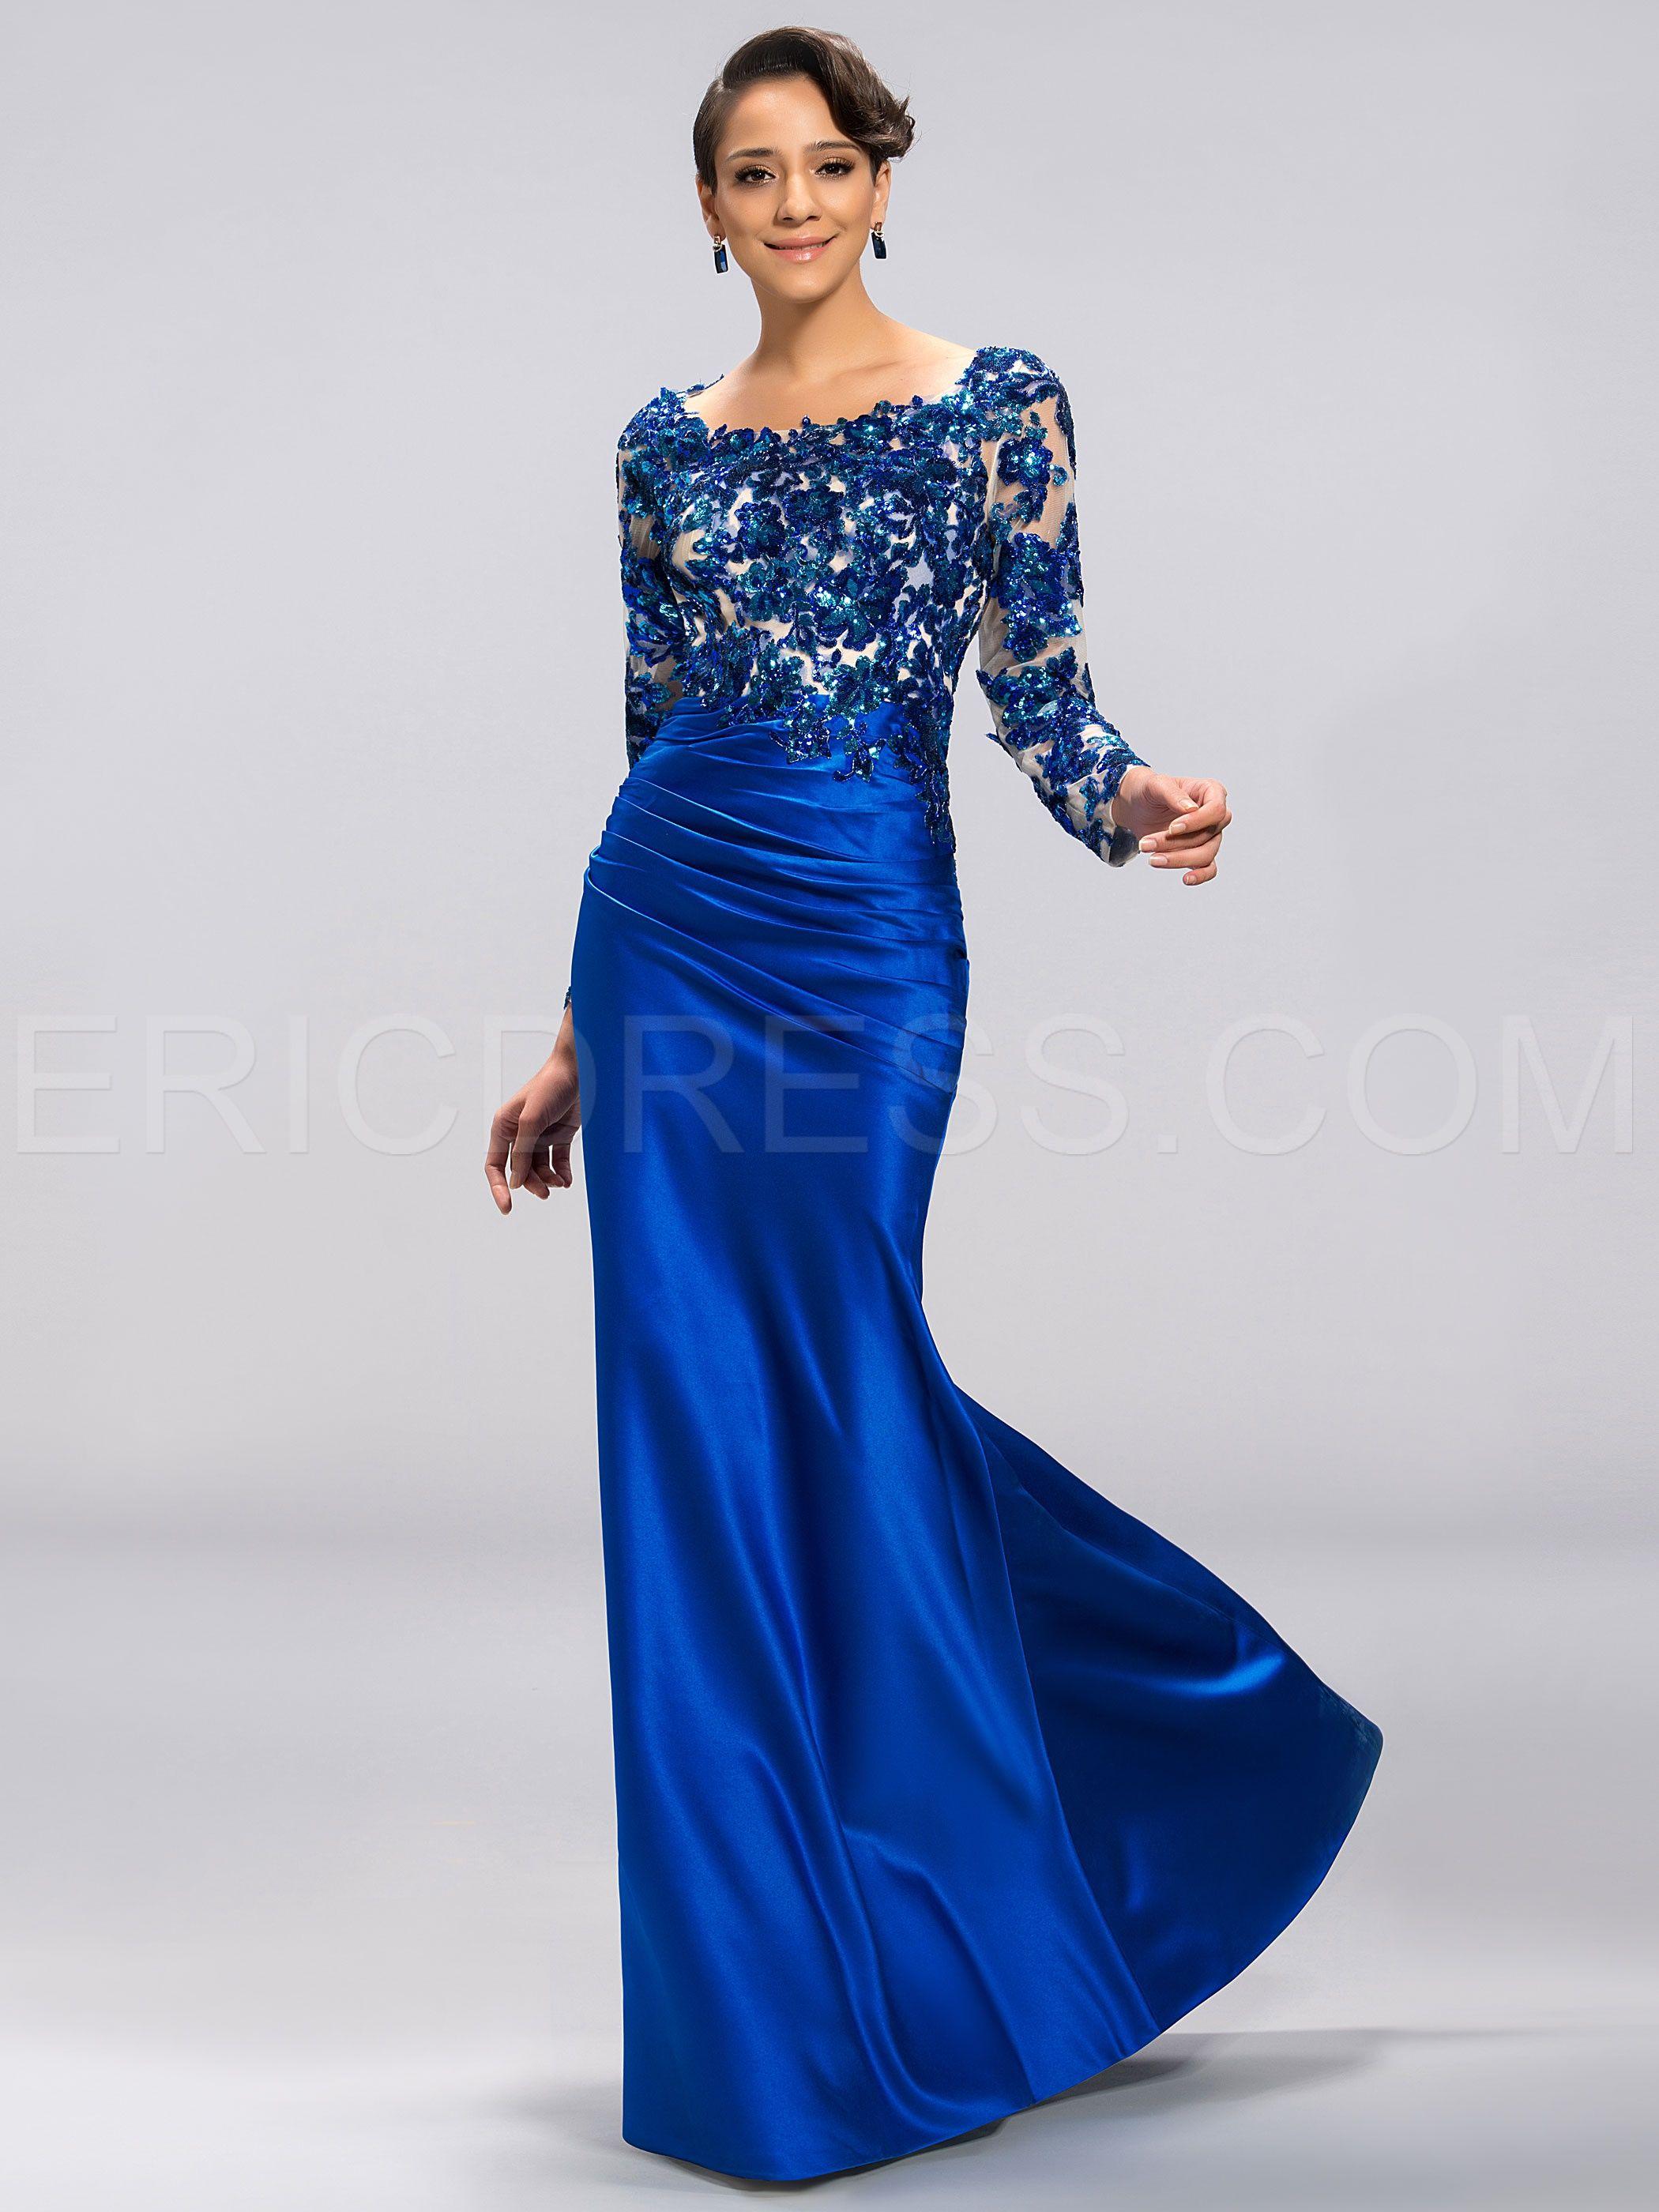 10729c0b686 Elegant Scoop Long Sleeves Appliques Backless Evening Dress Vintage Evening  Dresses- ericdress.com 11052961